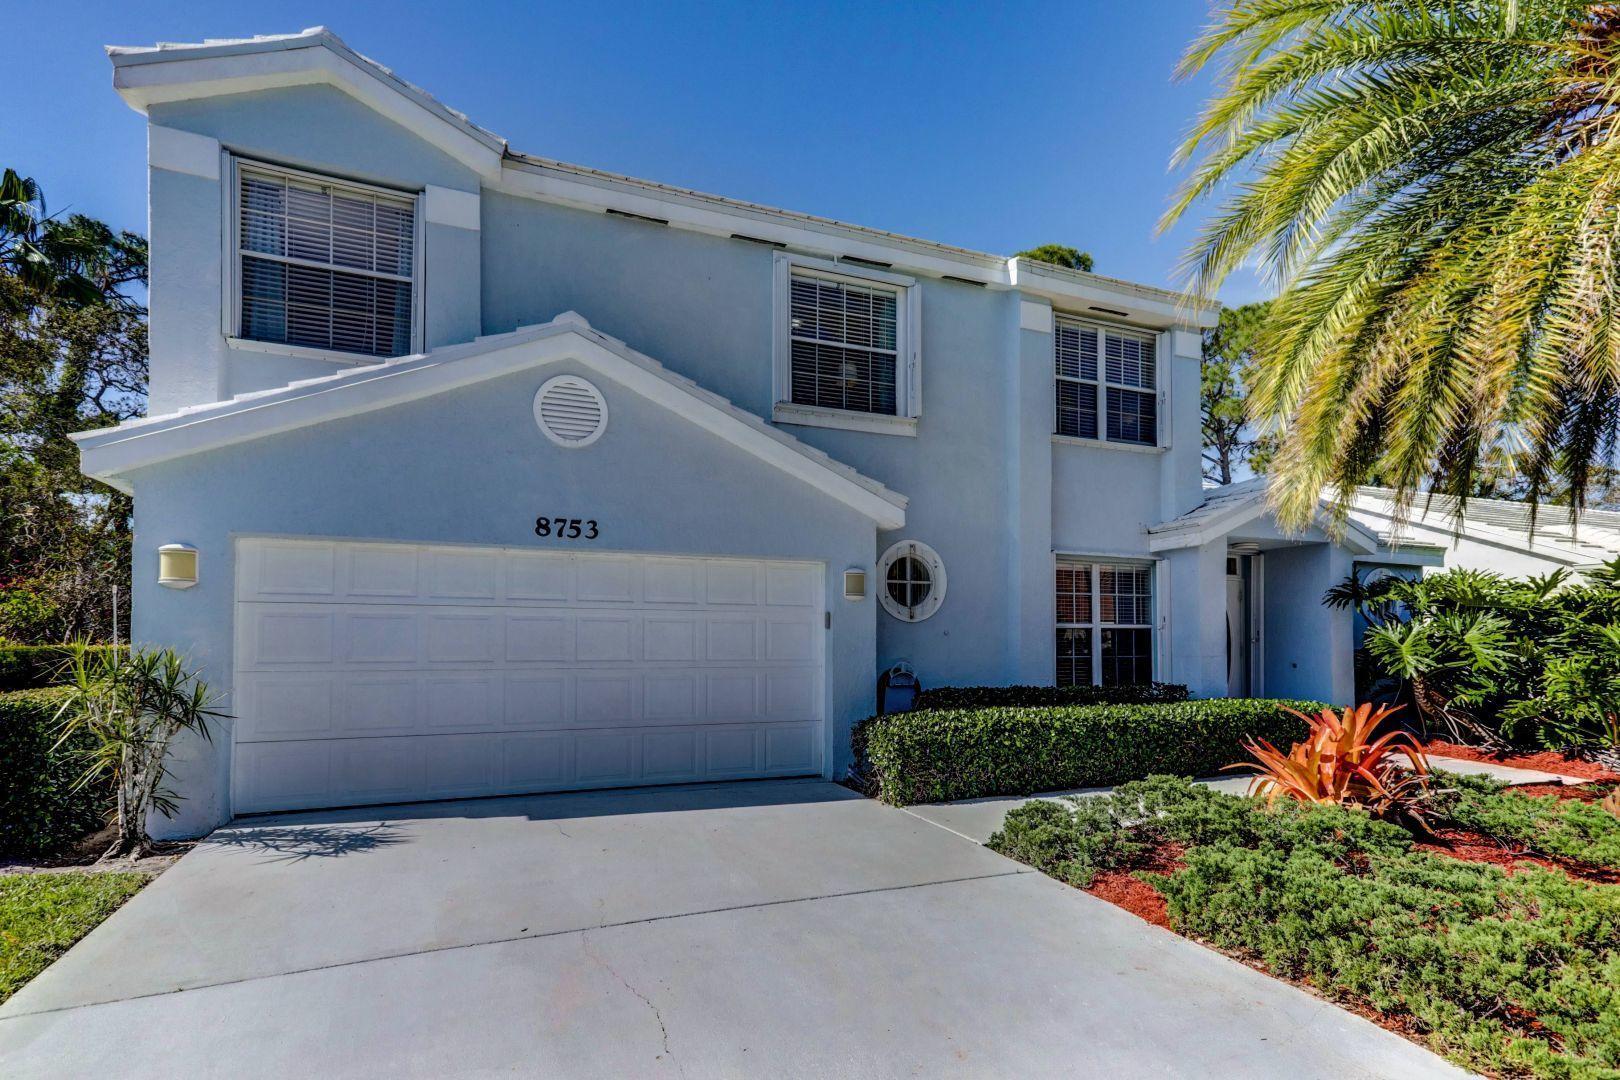 Home for sale in North Passage Tequesta Florida